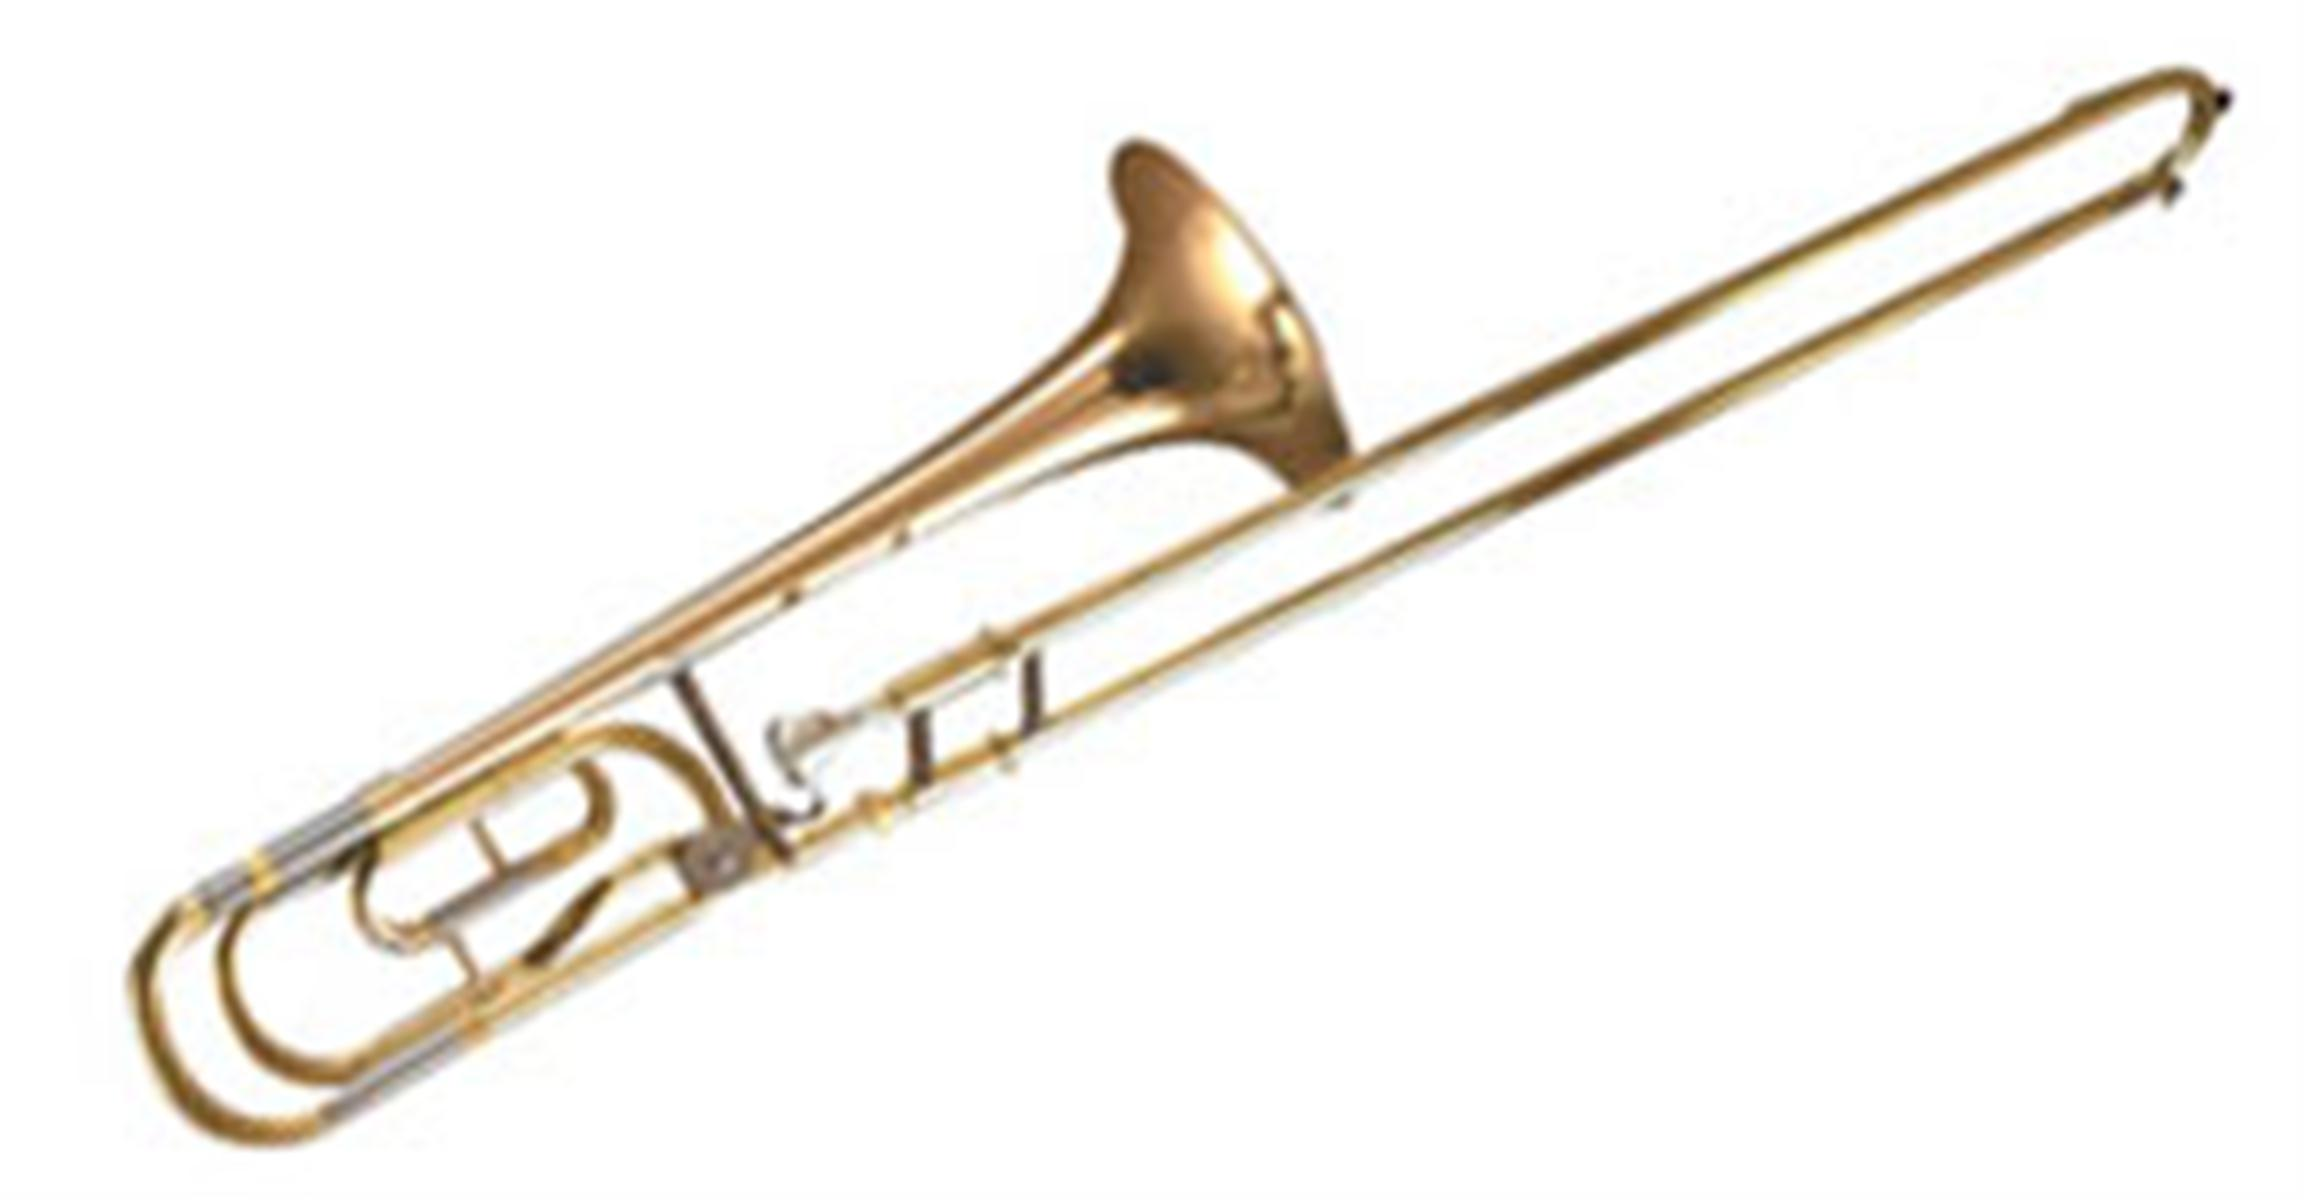 Trigger trombone clipart graphic transparent stock Trombone clipart pixel - 64 transparent clip arts, images ... graphic transparent stock